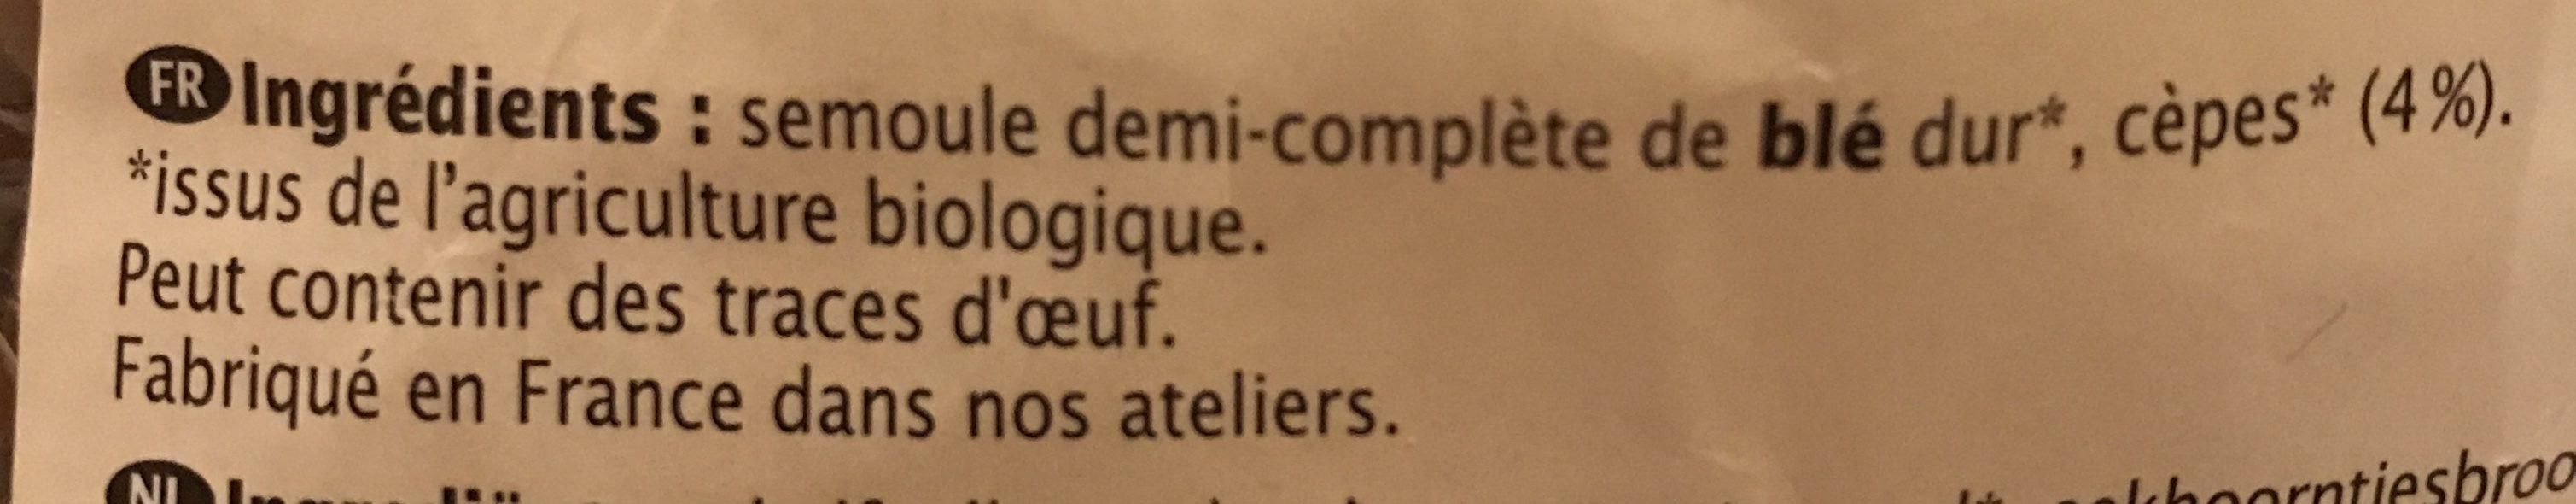 Tortils aux Cèpes - Ingredients